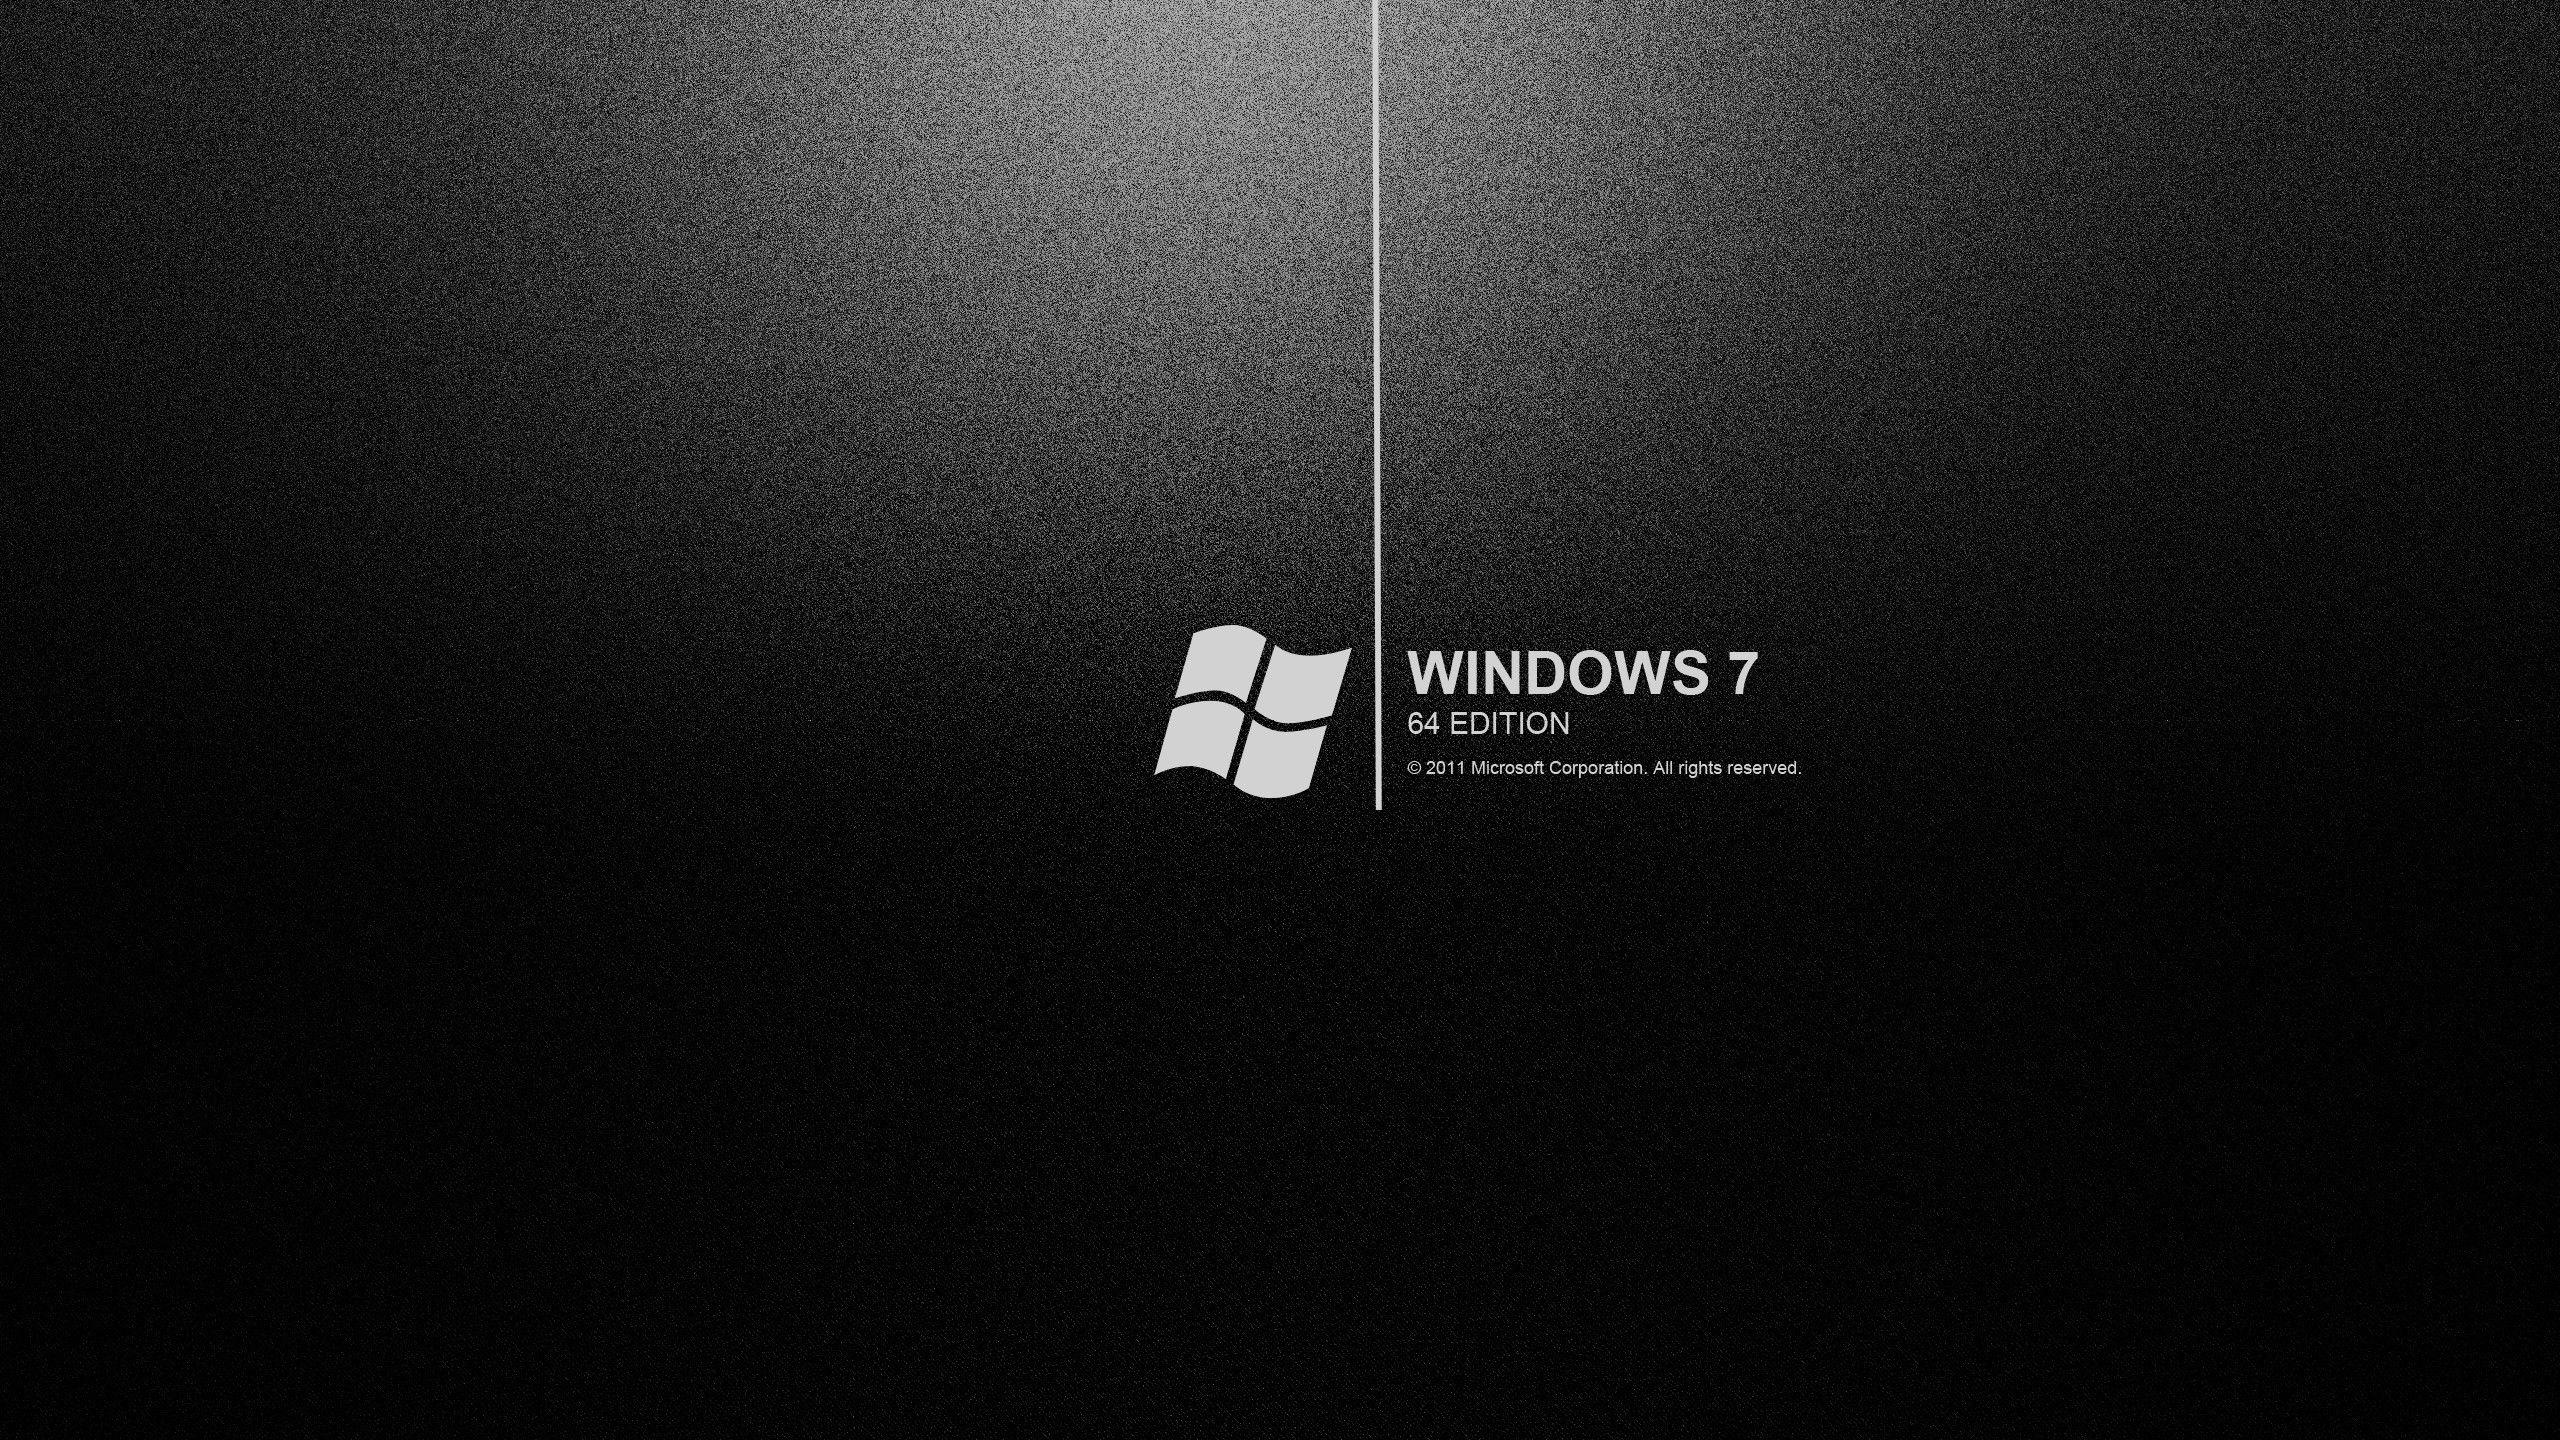 New Windows 7 Black Desktop Wallpaper Dark Wallpaper Hd Dark Wallpapers Desktop Wallpaper Black